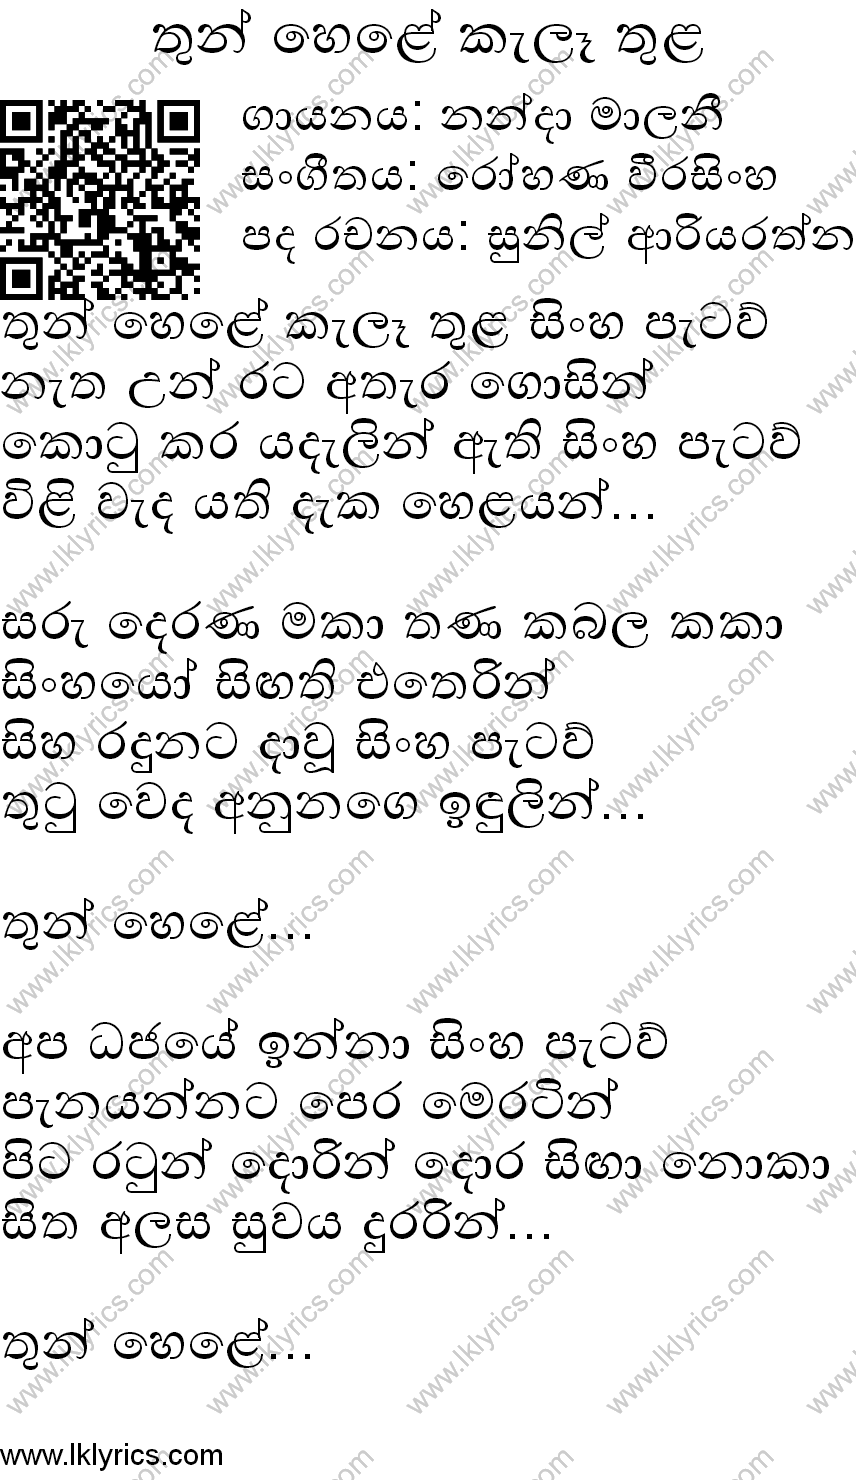 Image result for deshabhimani songs sri lanka lyrics ...